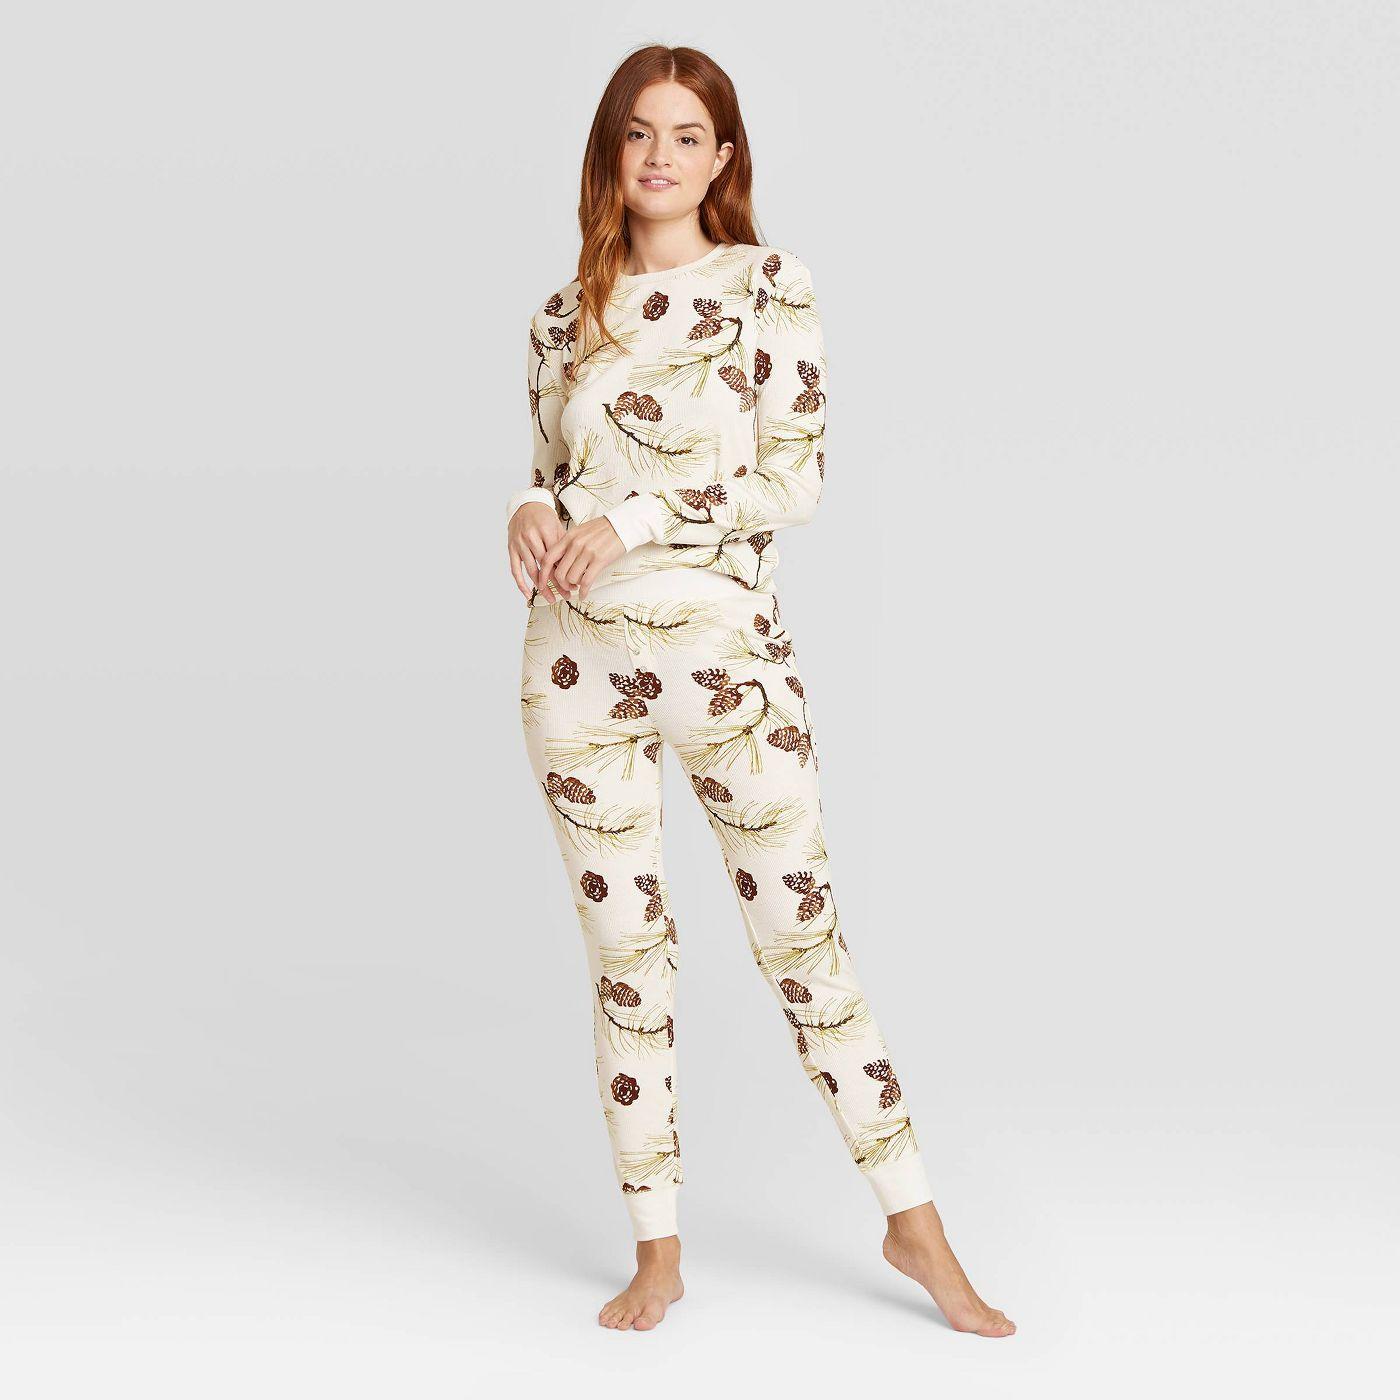 Women's Thermal Pajama Set - Stars Above™ - image 1 of 5